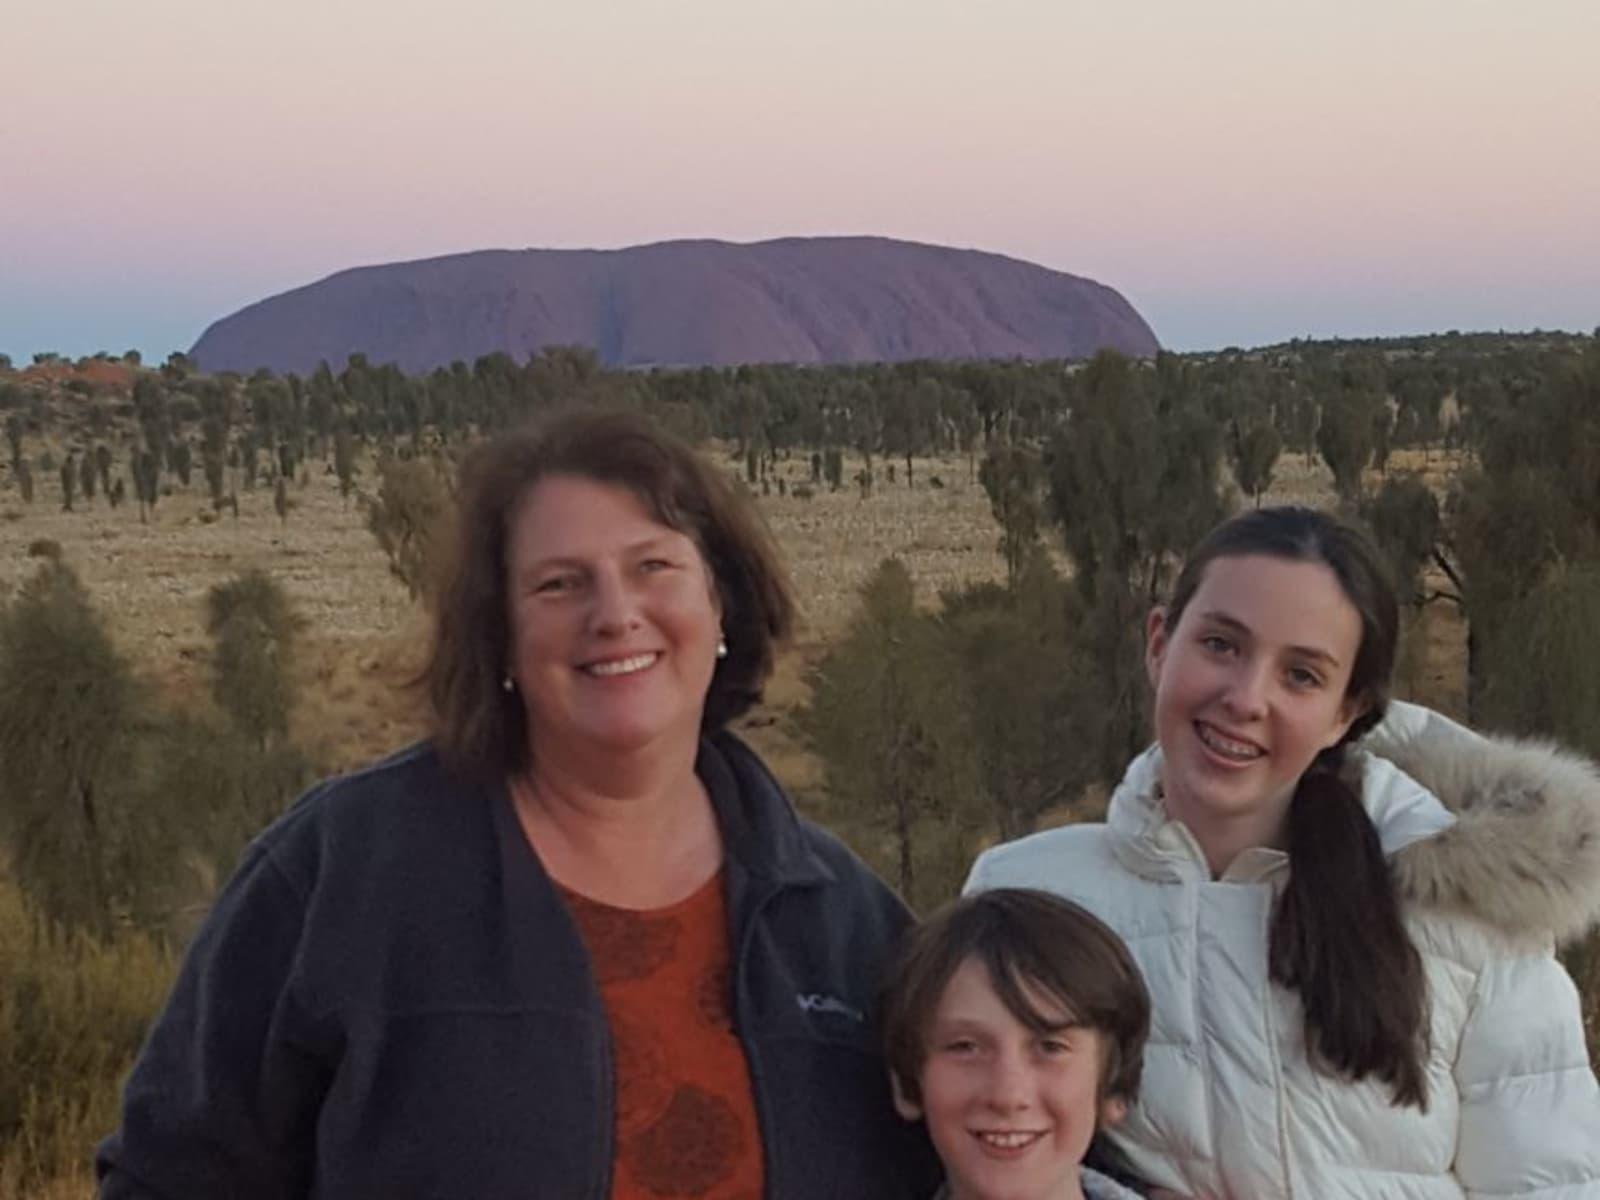 Anna & David from Port Macquarie, New South Wales, Australia